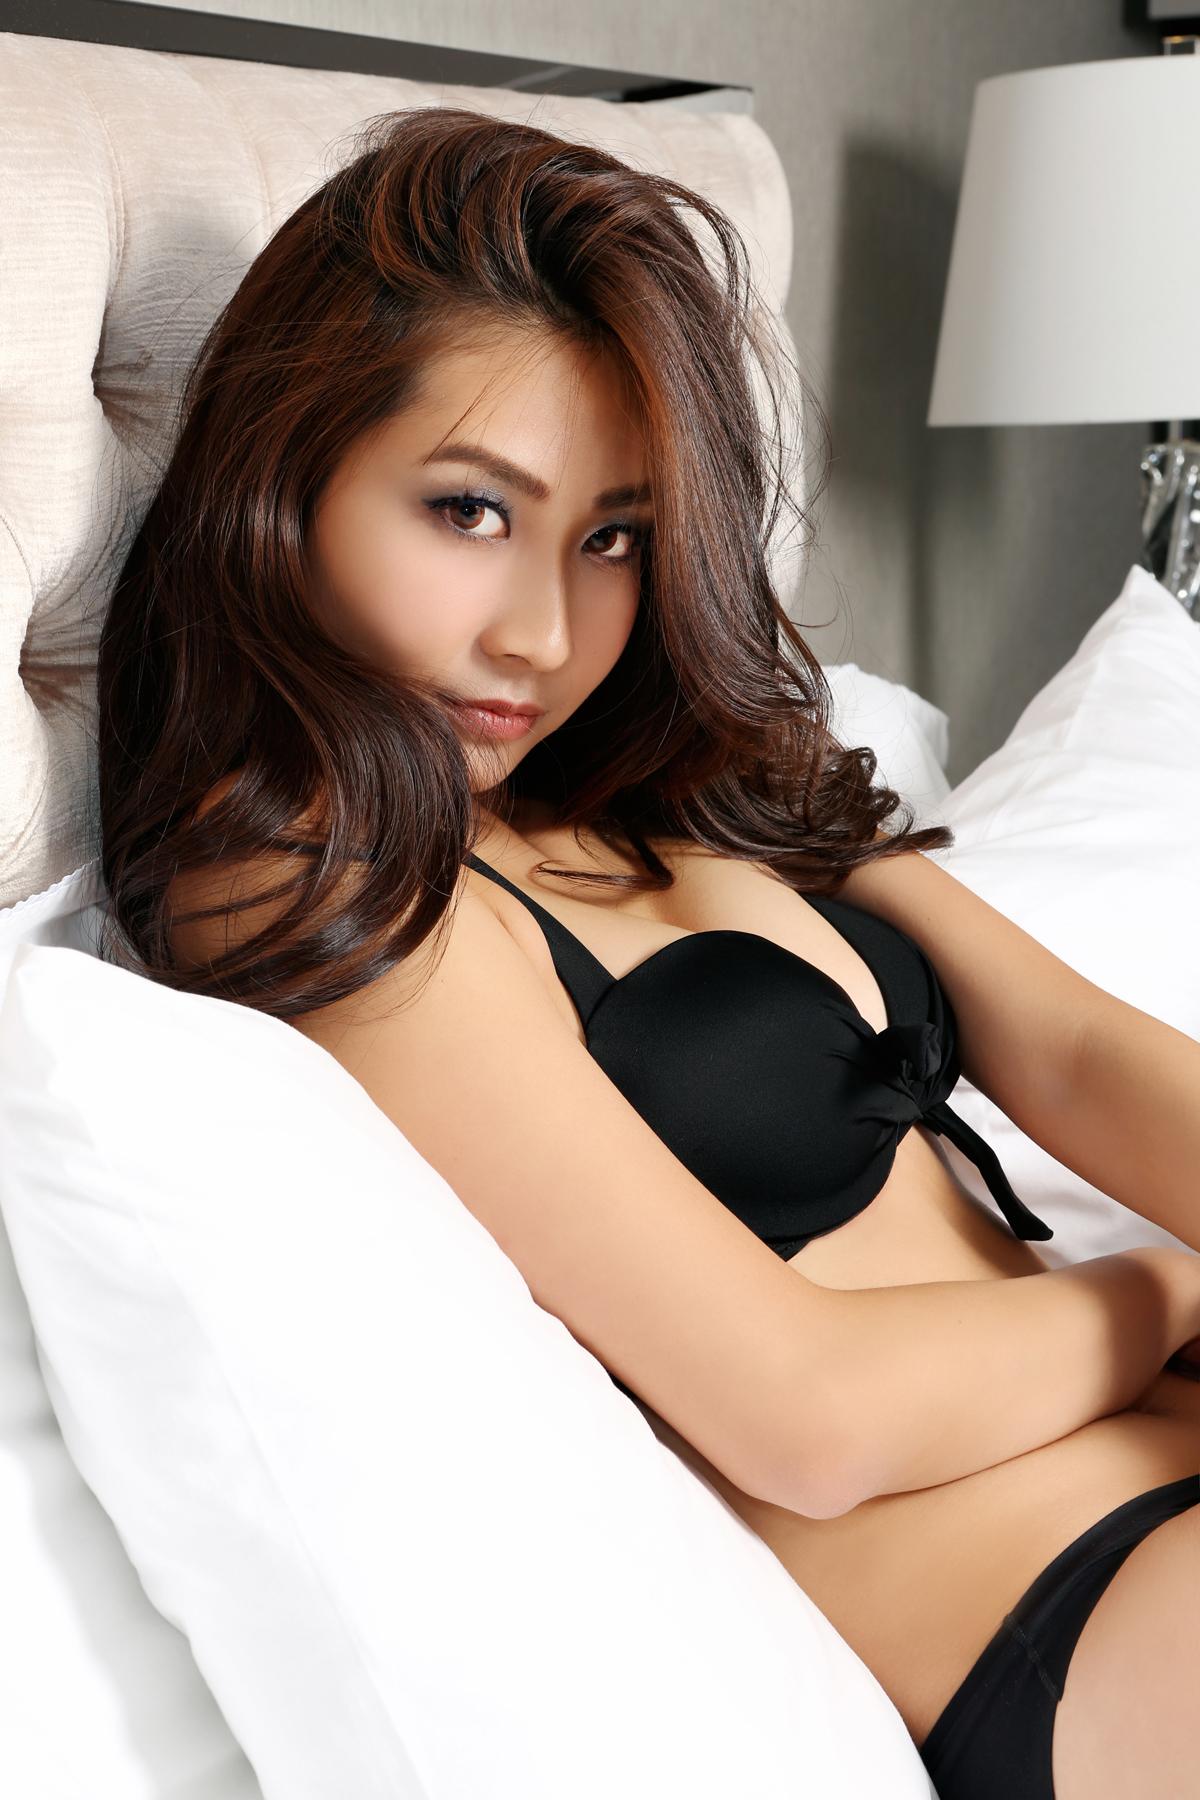 VNB magazine cover model for January issue: Virginia Liang